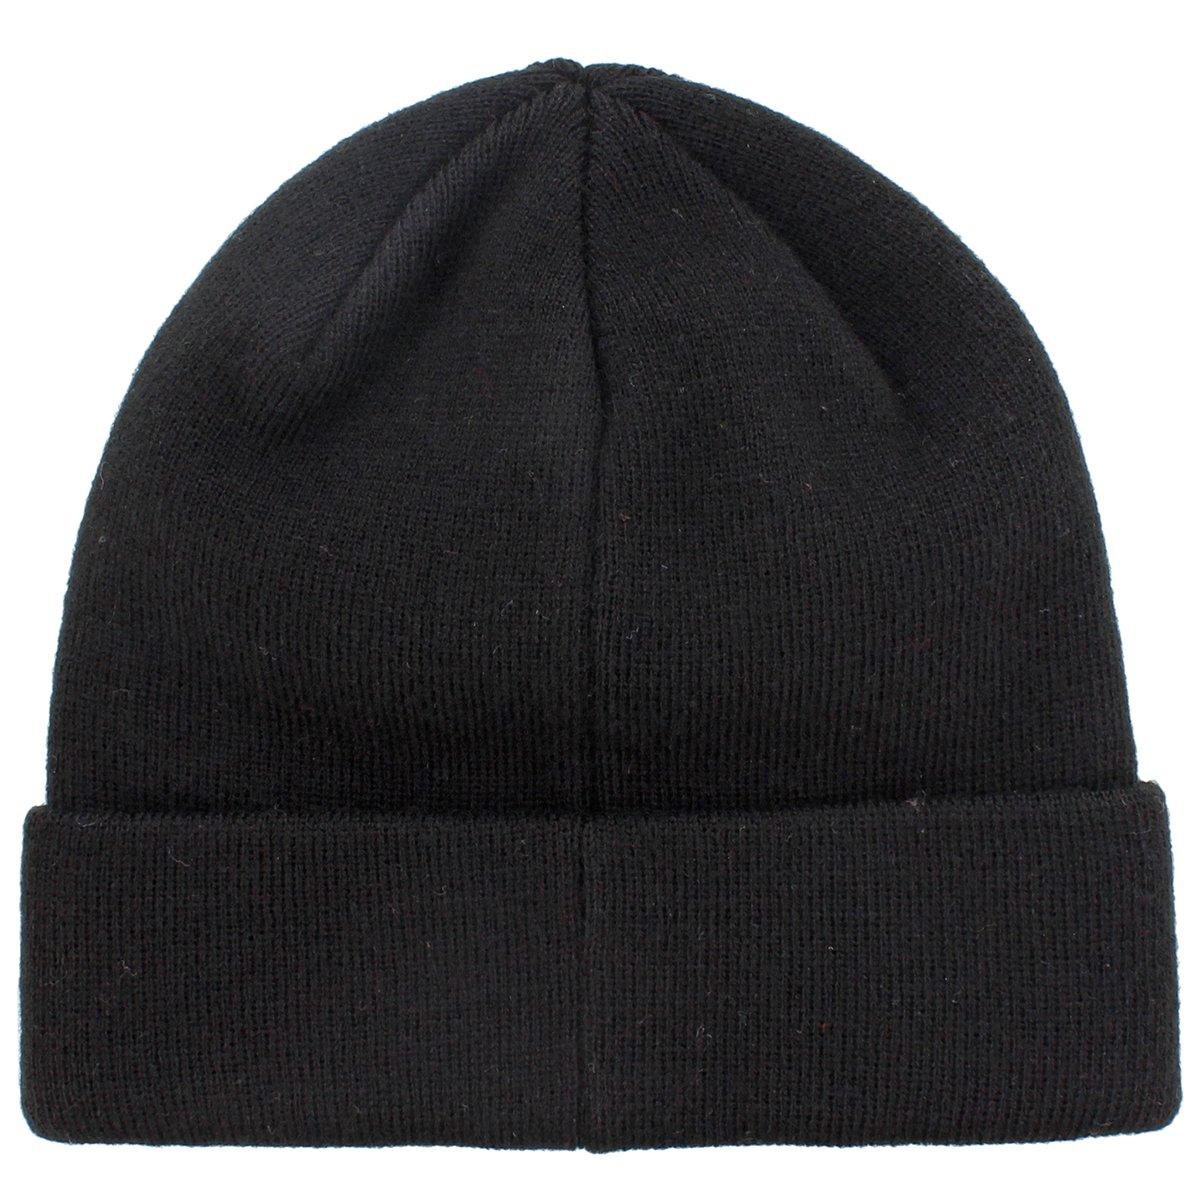 on sale 83446 f3c42 Amazon.com   adidas Men s Originals Trefoil Knit Beanie, Black, One Size    Sports   Outdoors